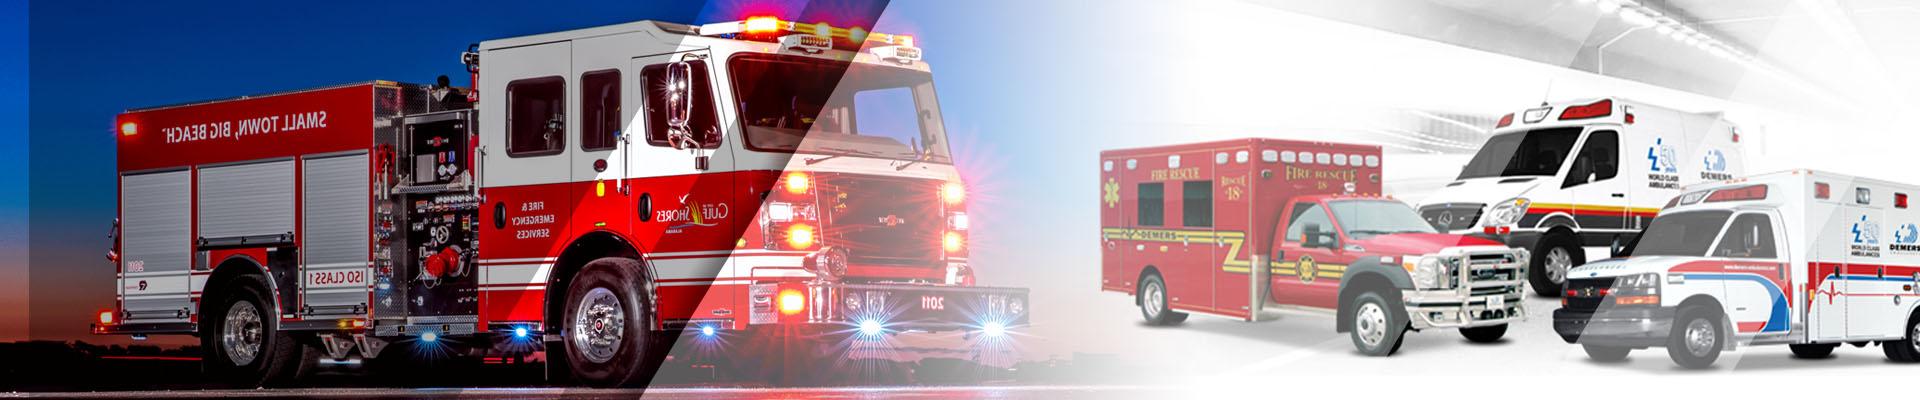 Fire trucks Ambulance camera system kit banner